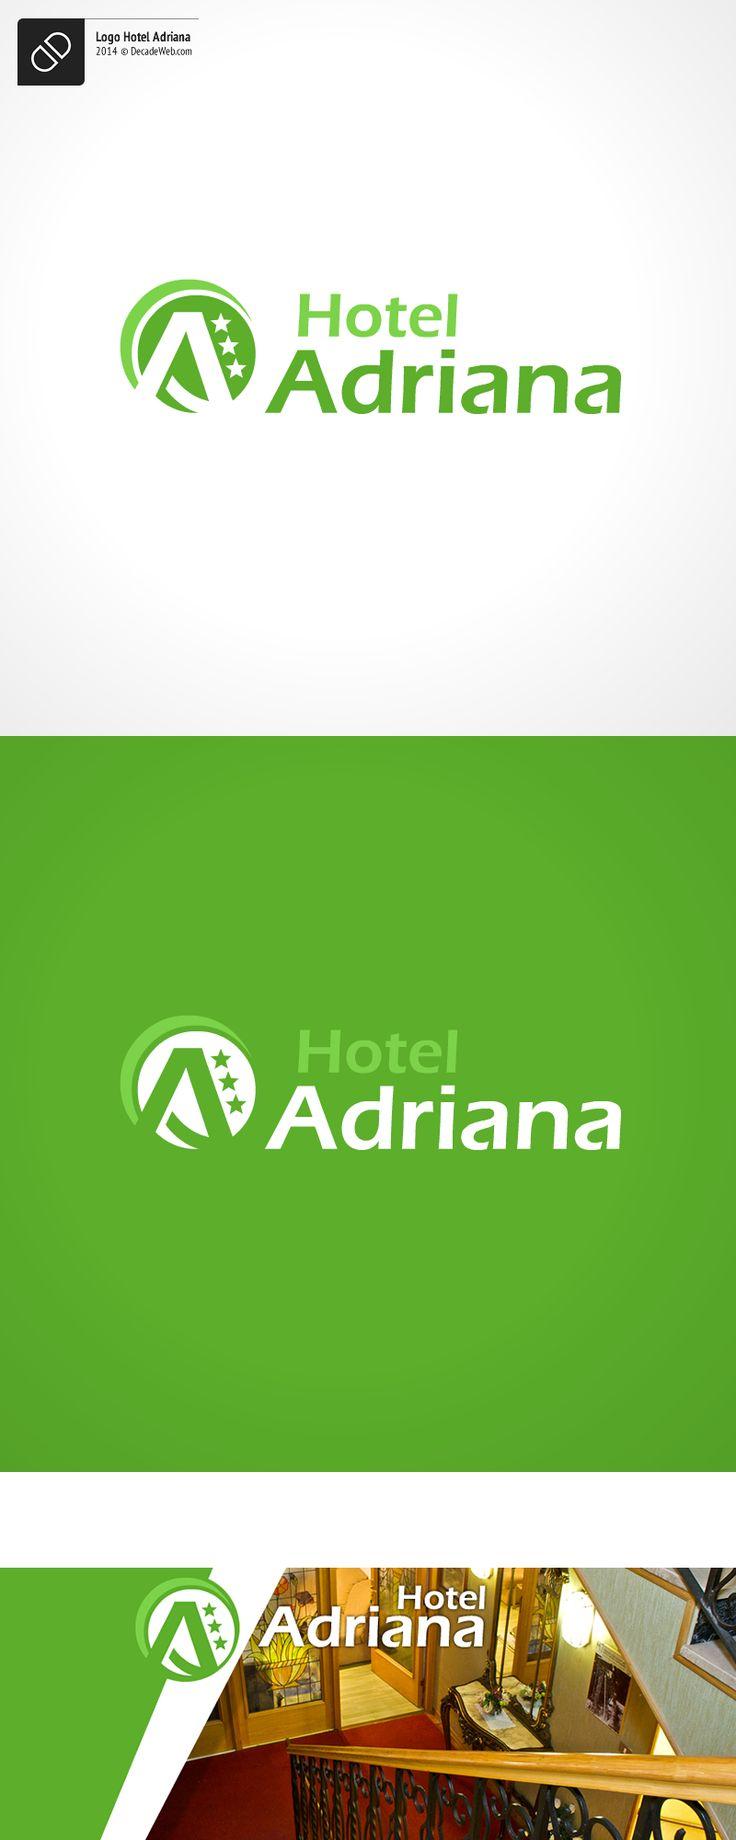 #Logo Hotel Adriana by #DecadeWeb www.decadeweb.com